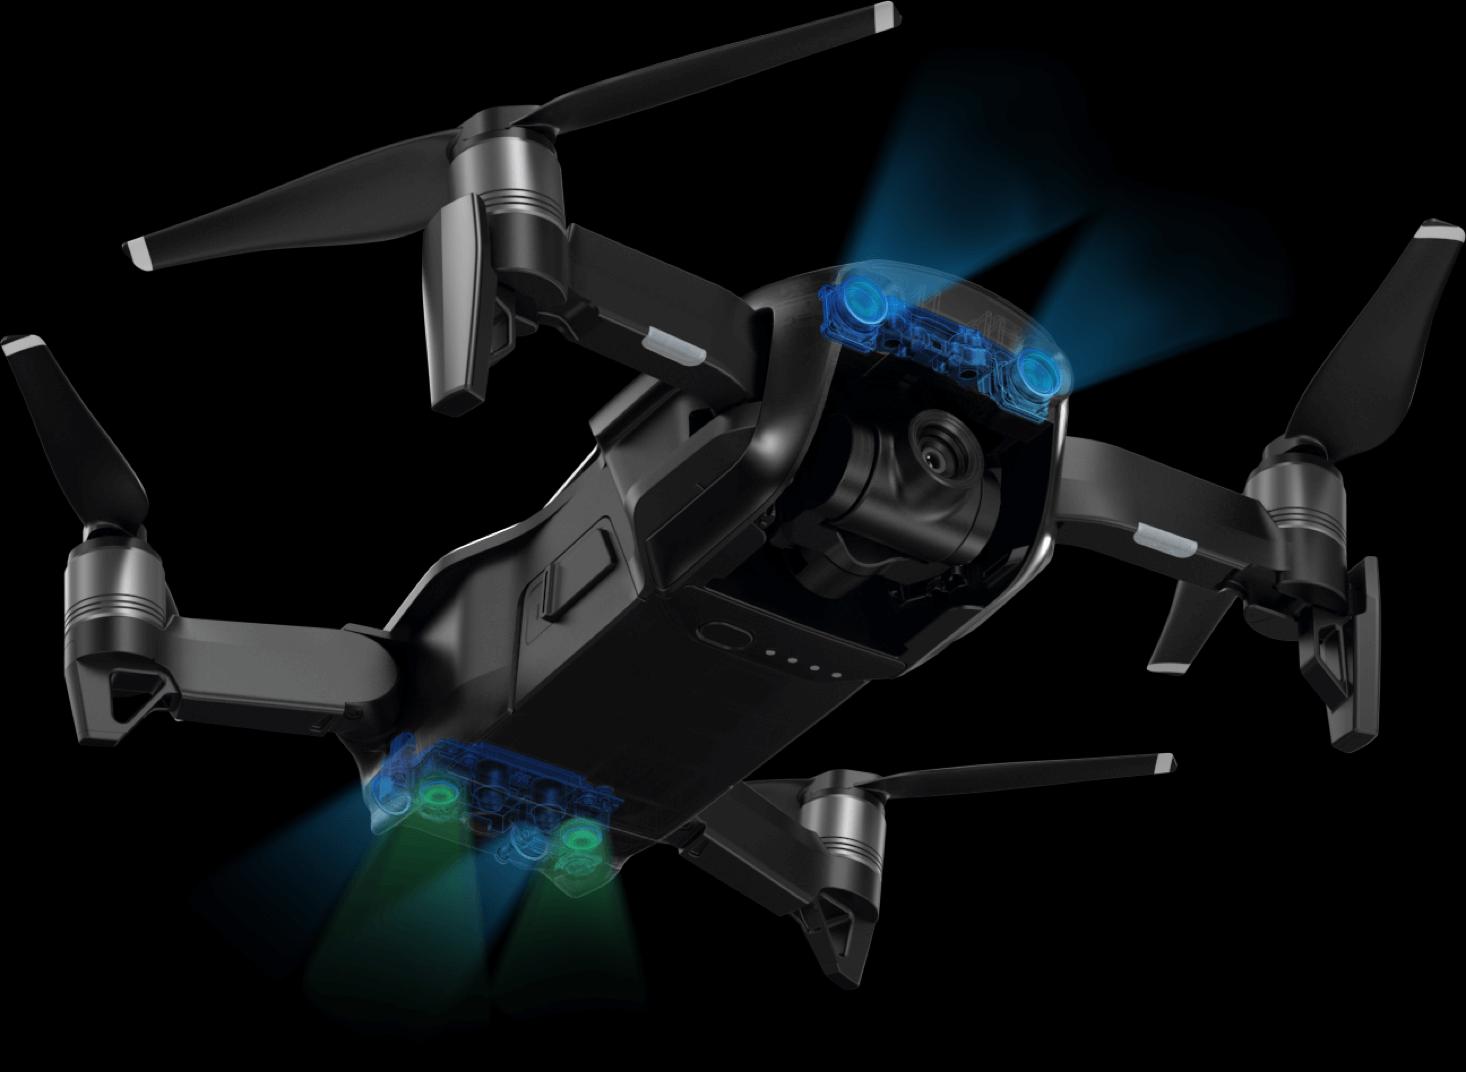 Скачать mavic air vision plus батарея для квадрокоптера phantom 3